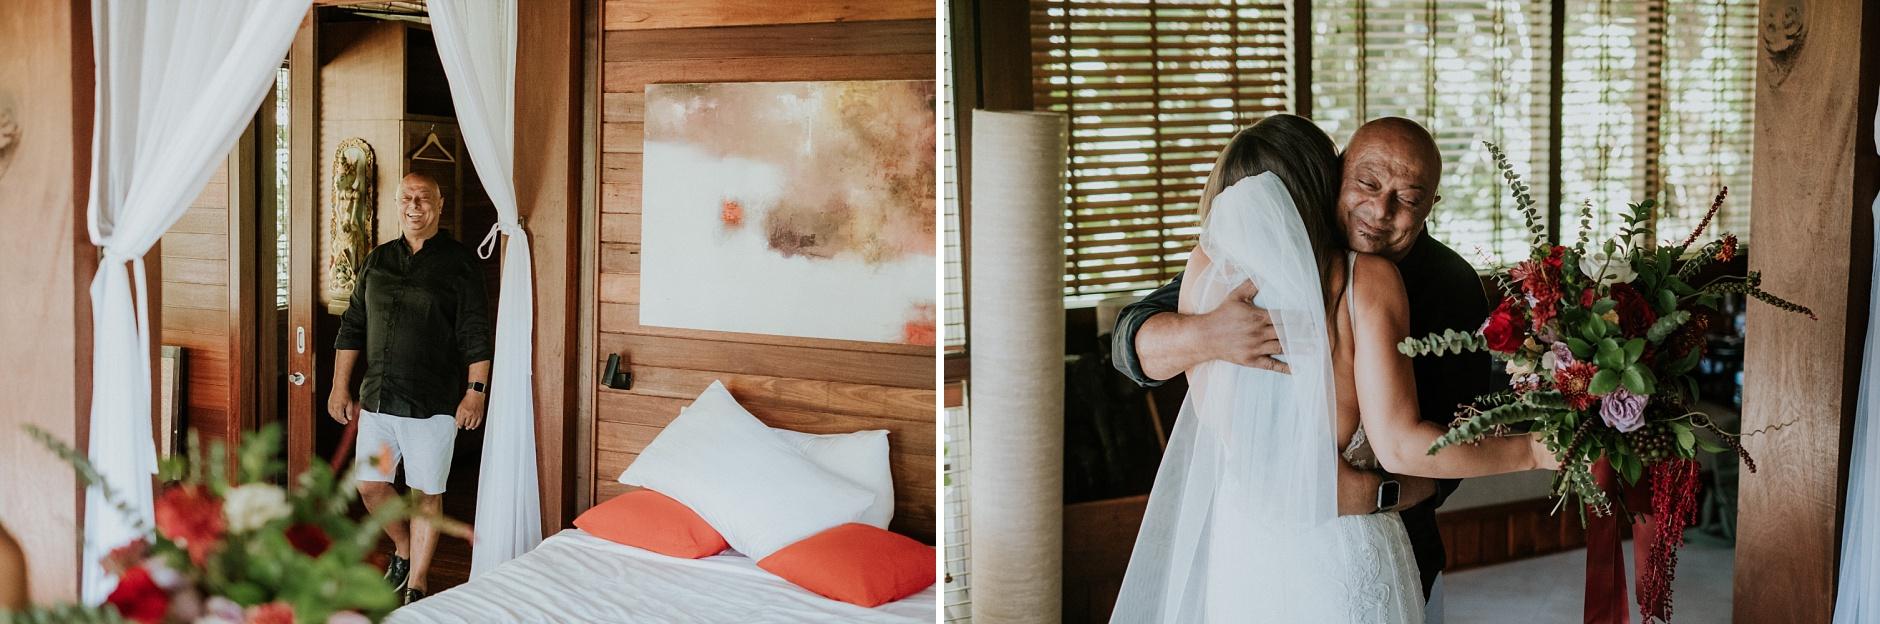 breanna&dan0238a_Bali-Wedding-Photographer.jpg